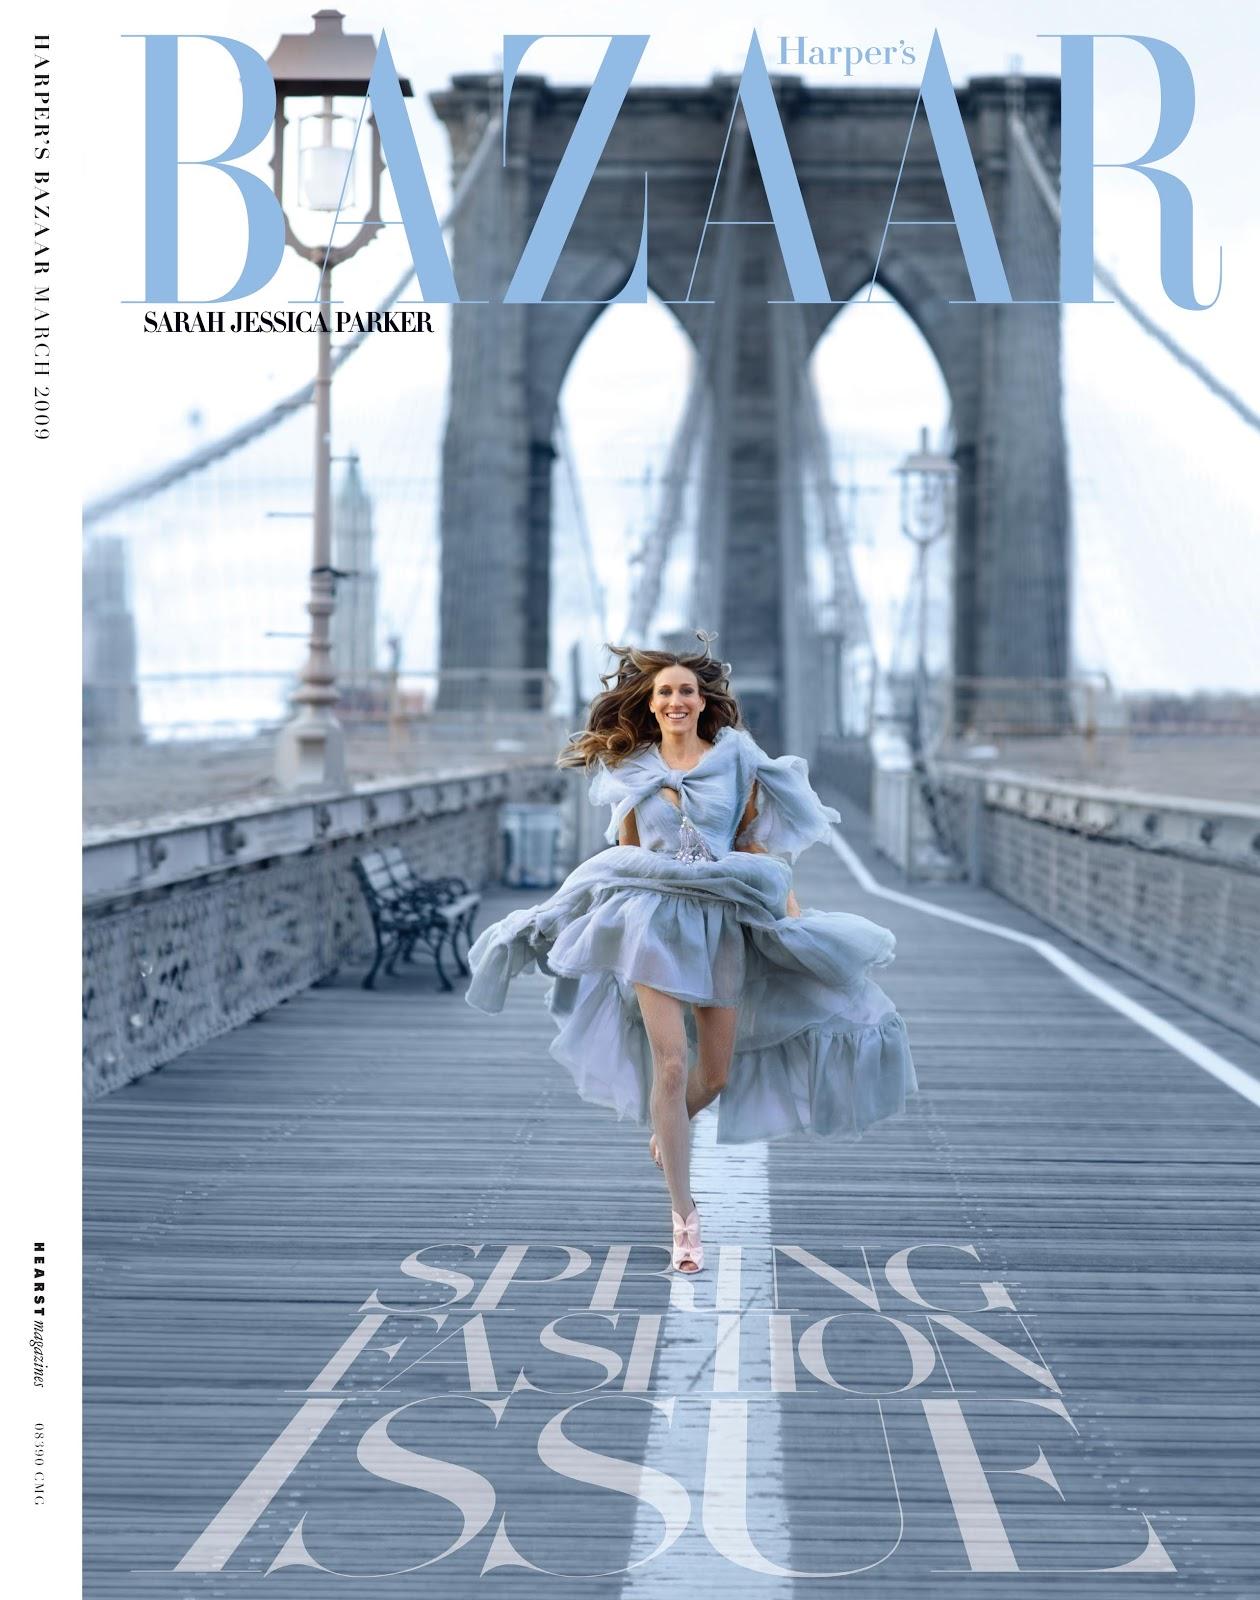 http://2.bp.blogspot.com/-U0uLi-afm78/ToEa21Dhc8I/AAAAAAAAASc/8E1dyBi3SKI/s1600/Harpers-Bazaar-Magazine-Cover-Sarah-Jessica-Parker+%25283%2529.jpg